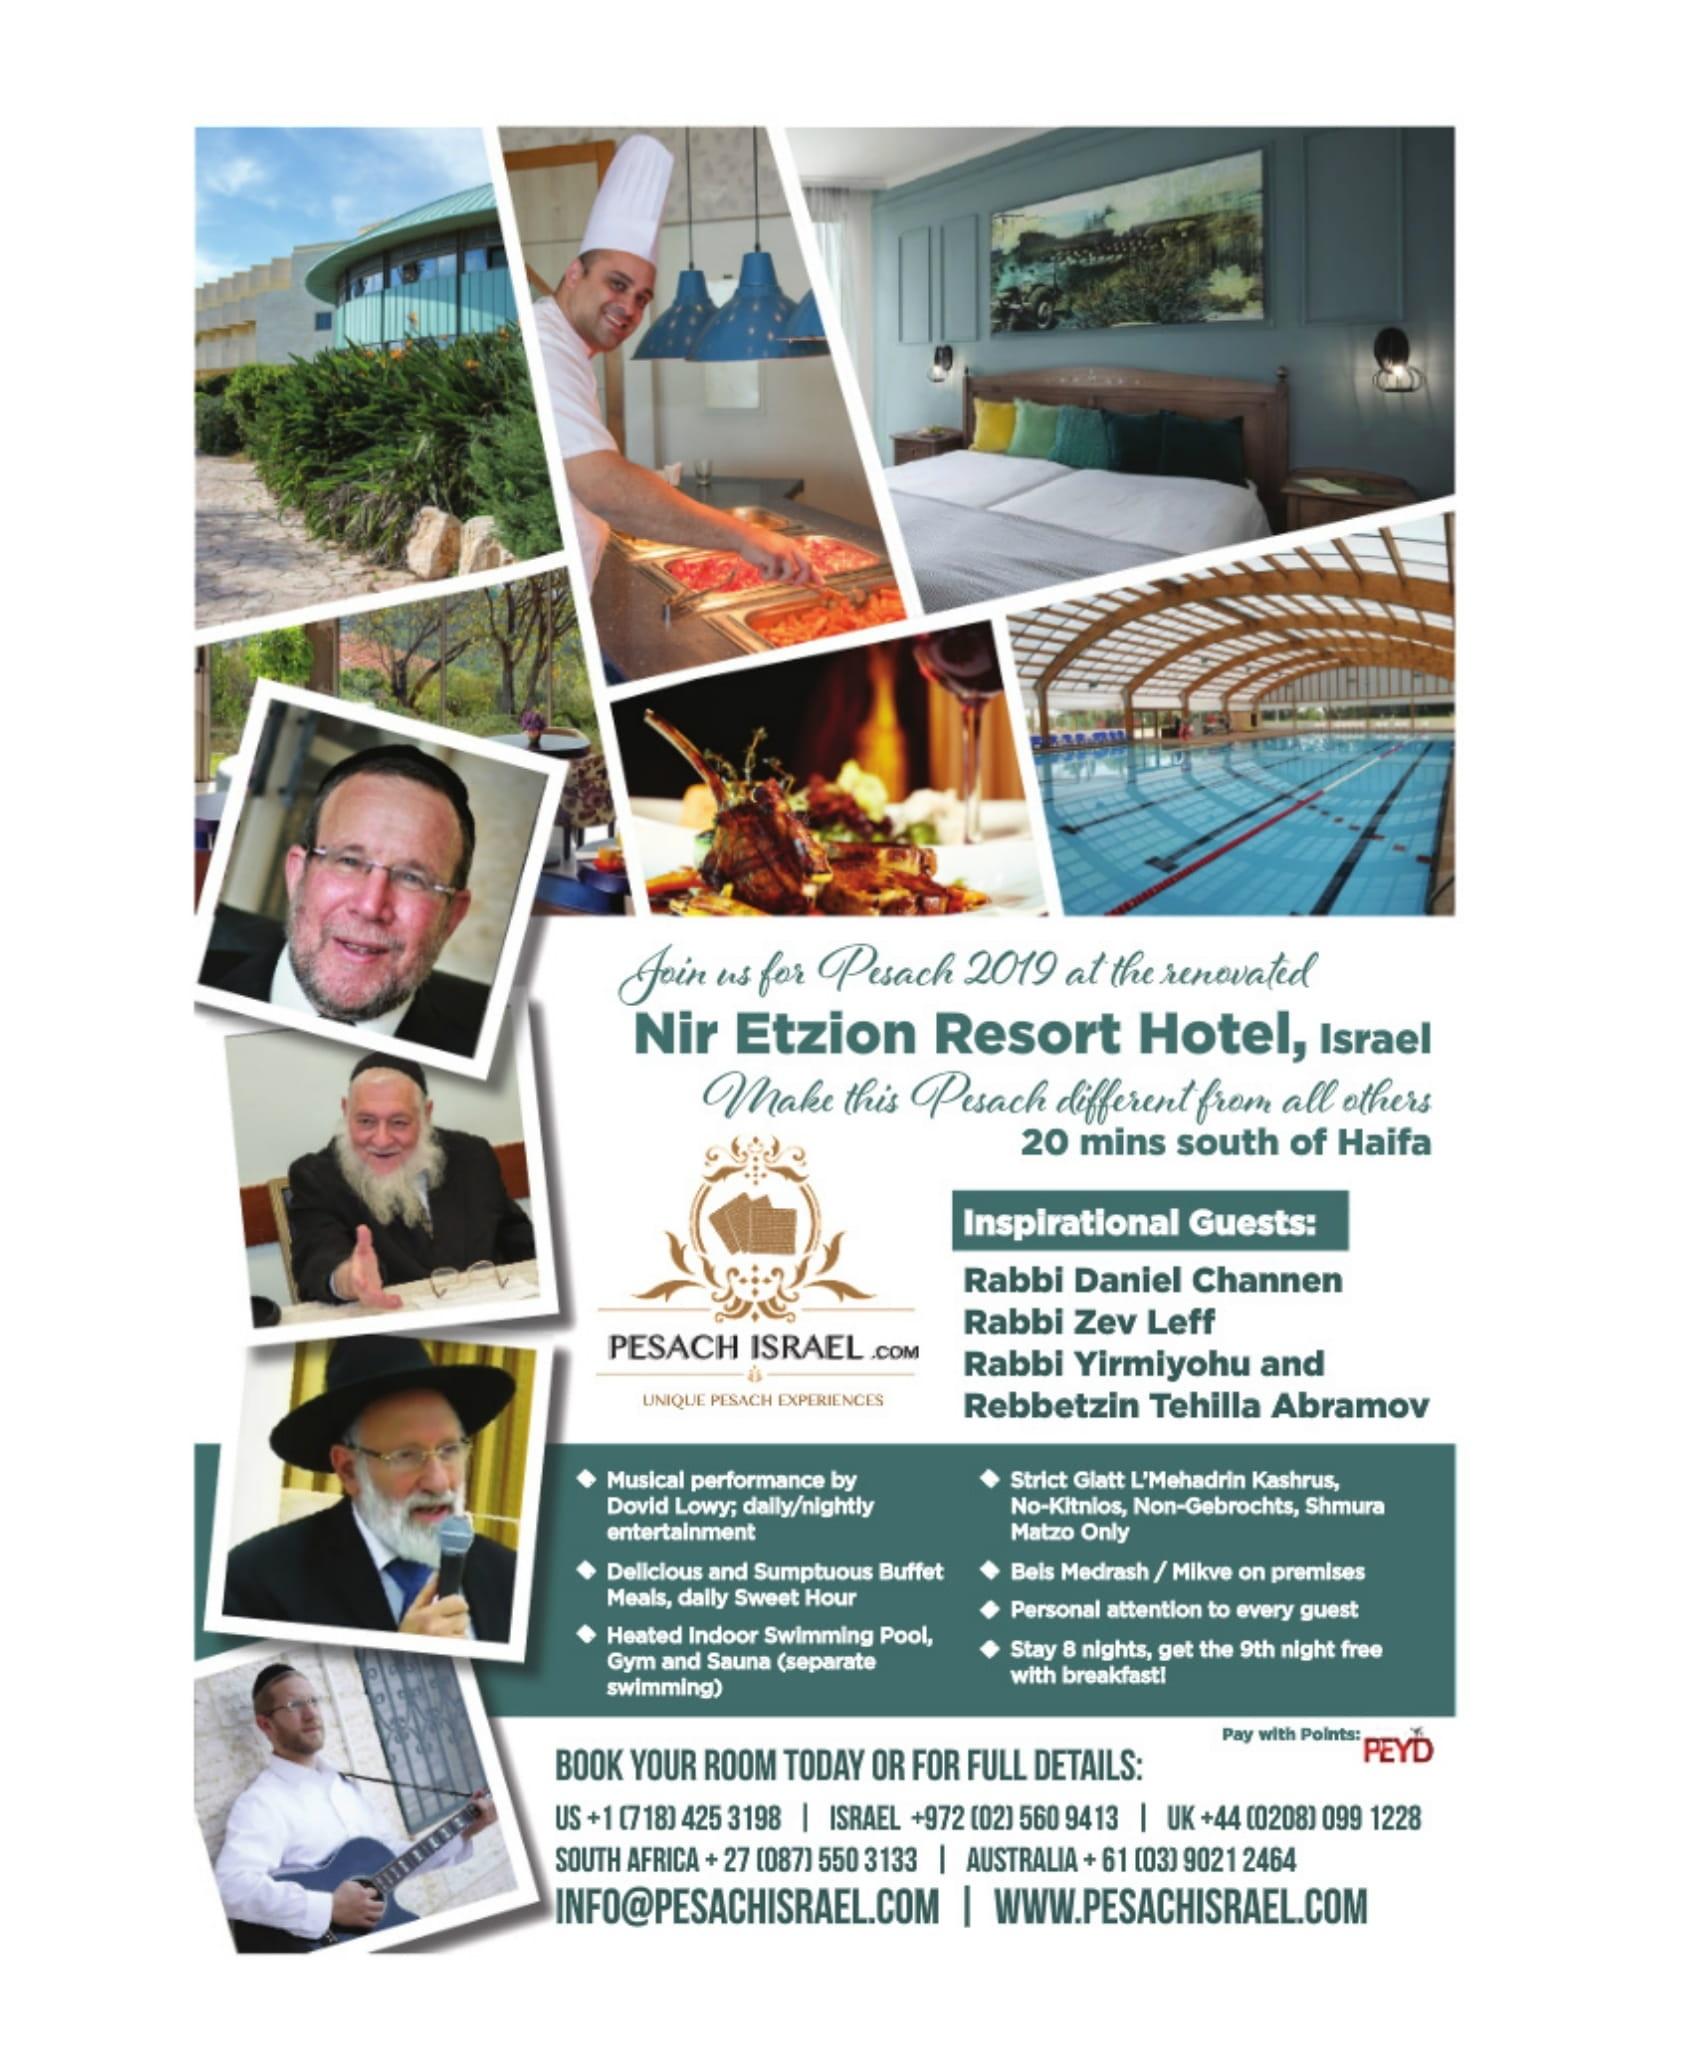 Pesach in Nir Etzion Resort Hotel, Israel - KosherGuru